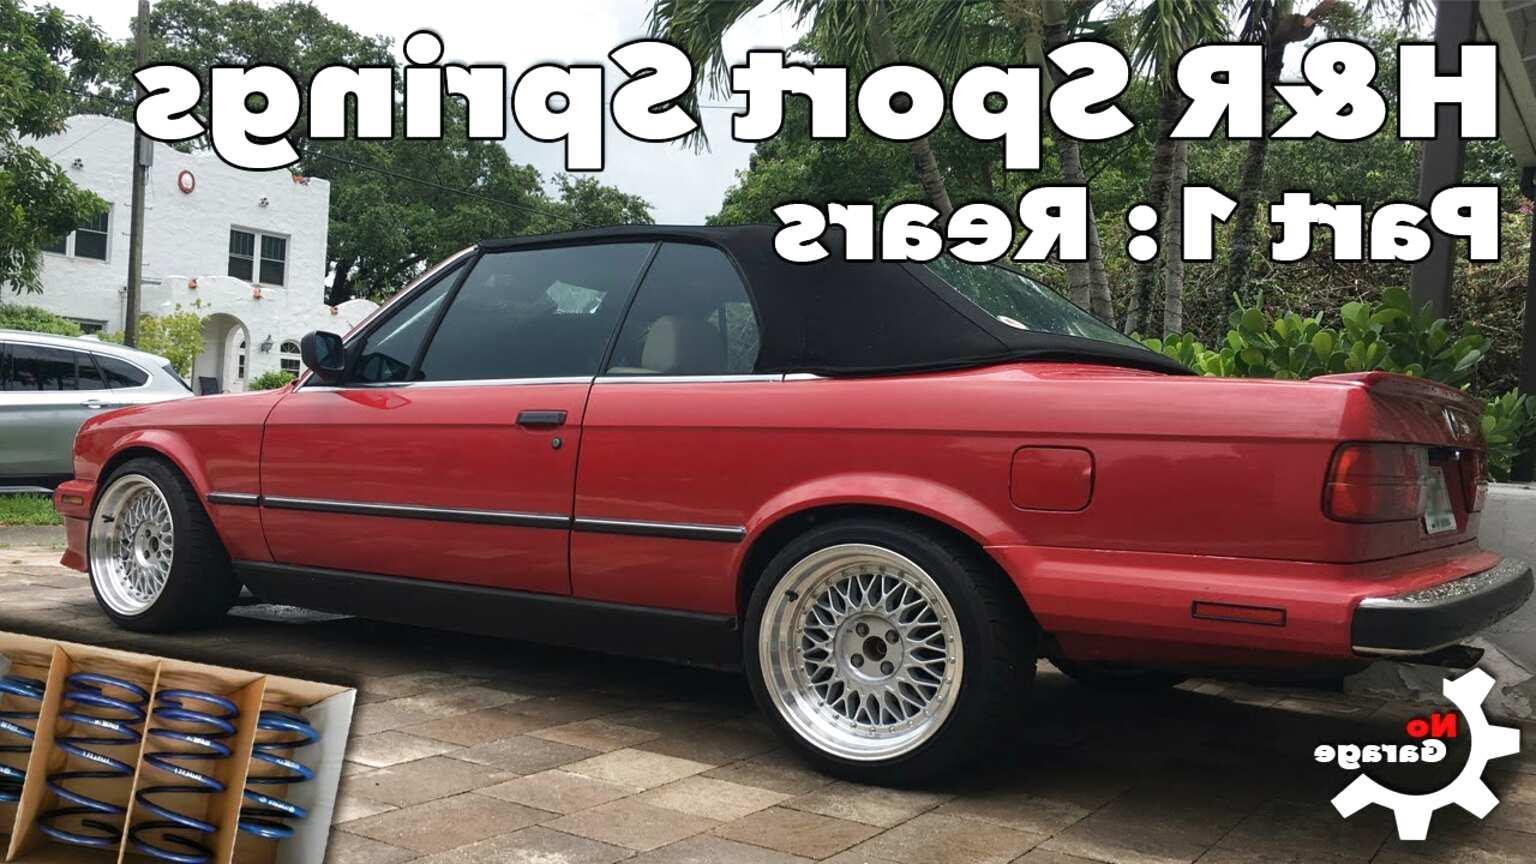 e30 springs for sale